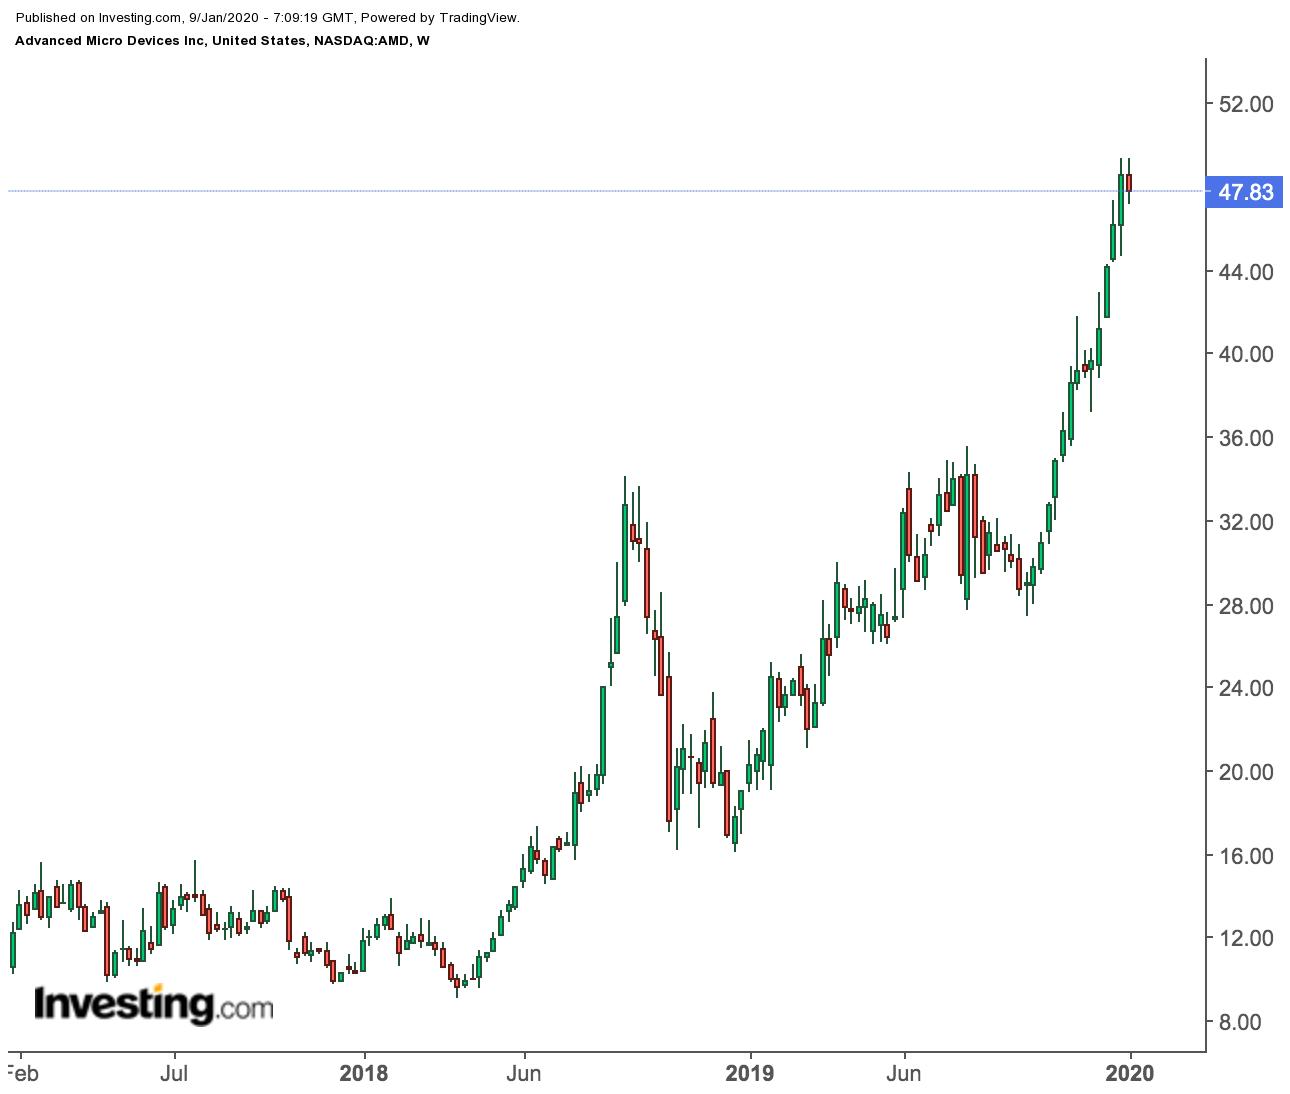 AMD Weekly Price Chart